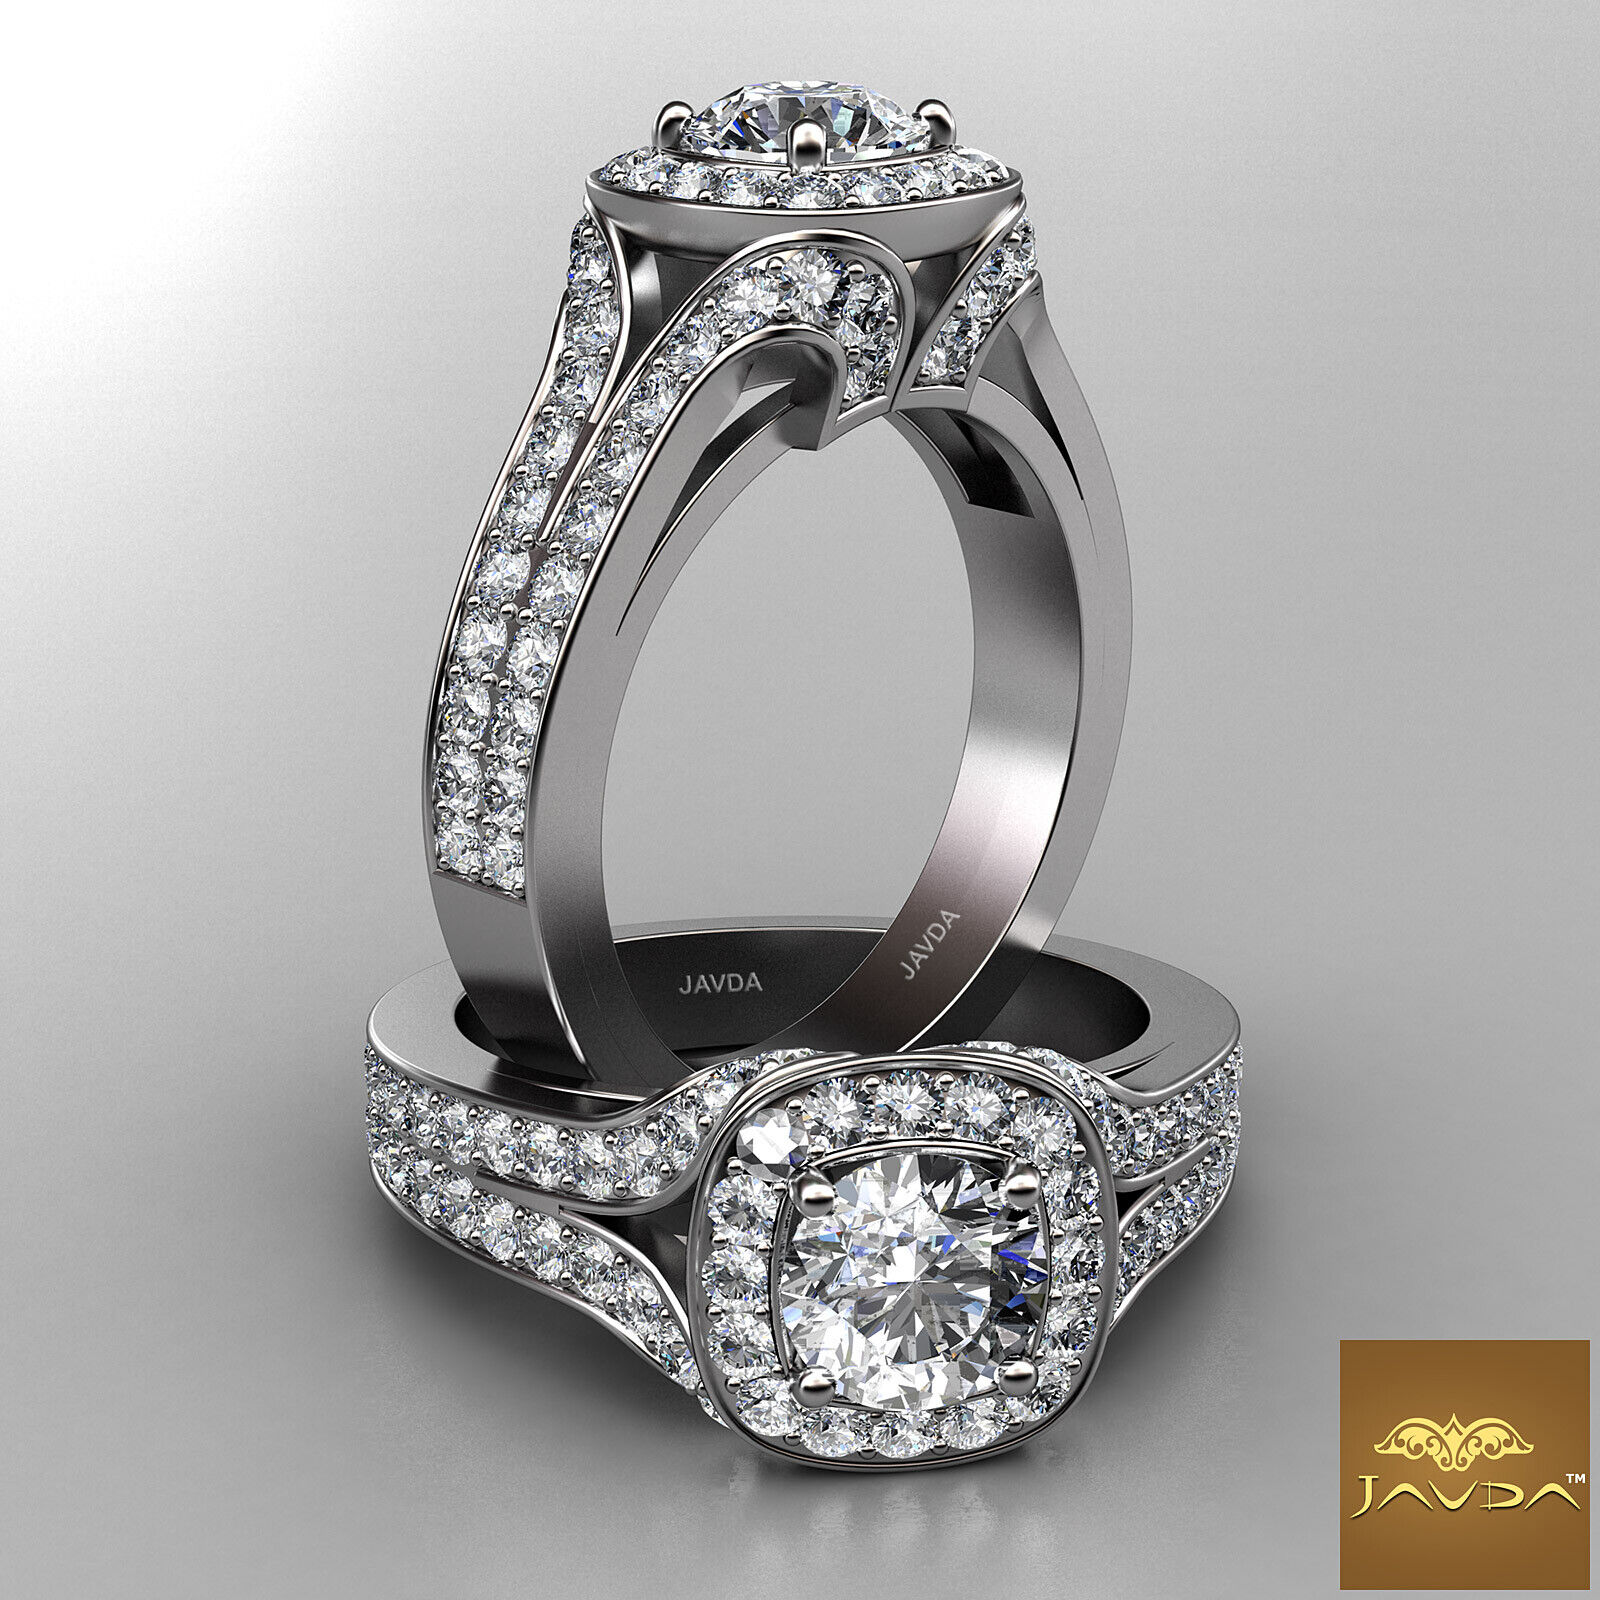 Halo Round Diamond Engagement V Shaped Split Shank Pave Ring GIA F VVS1 1.9 Ct